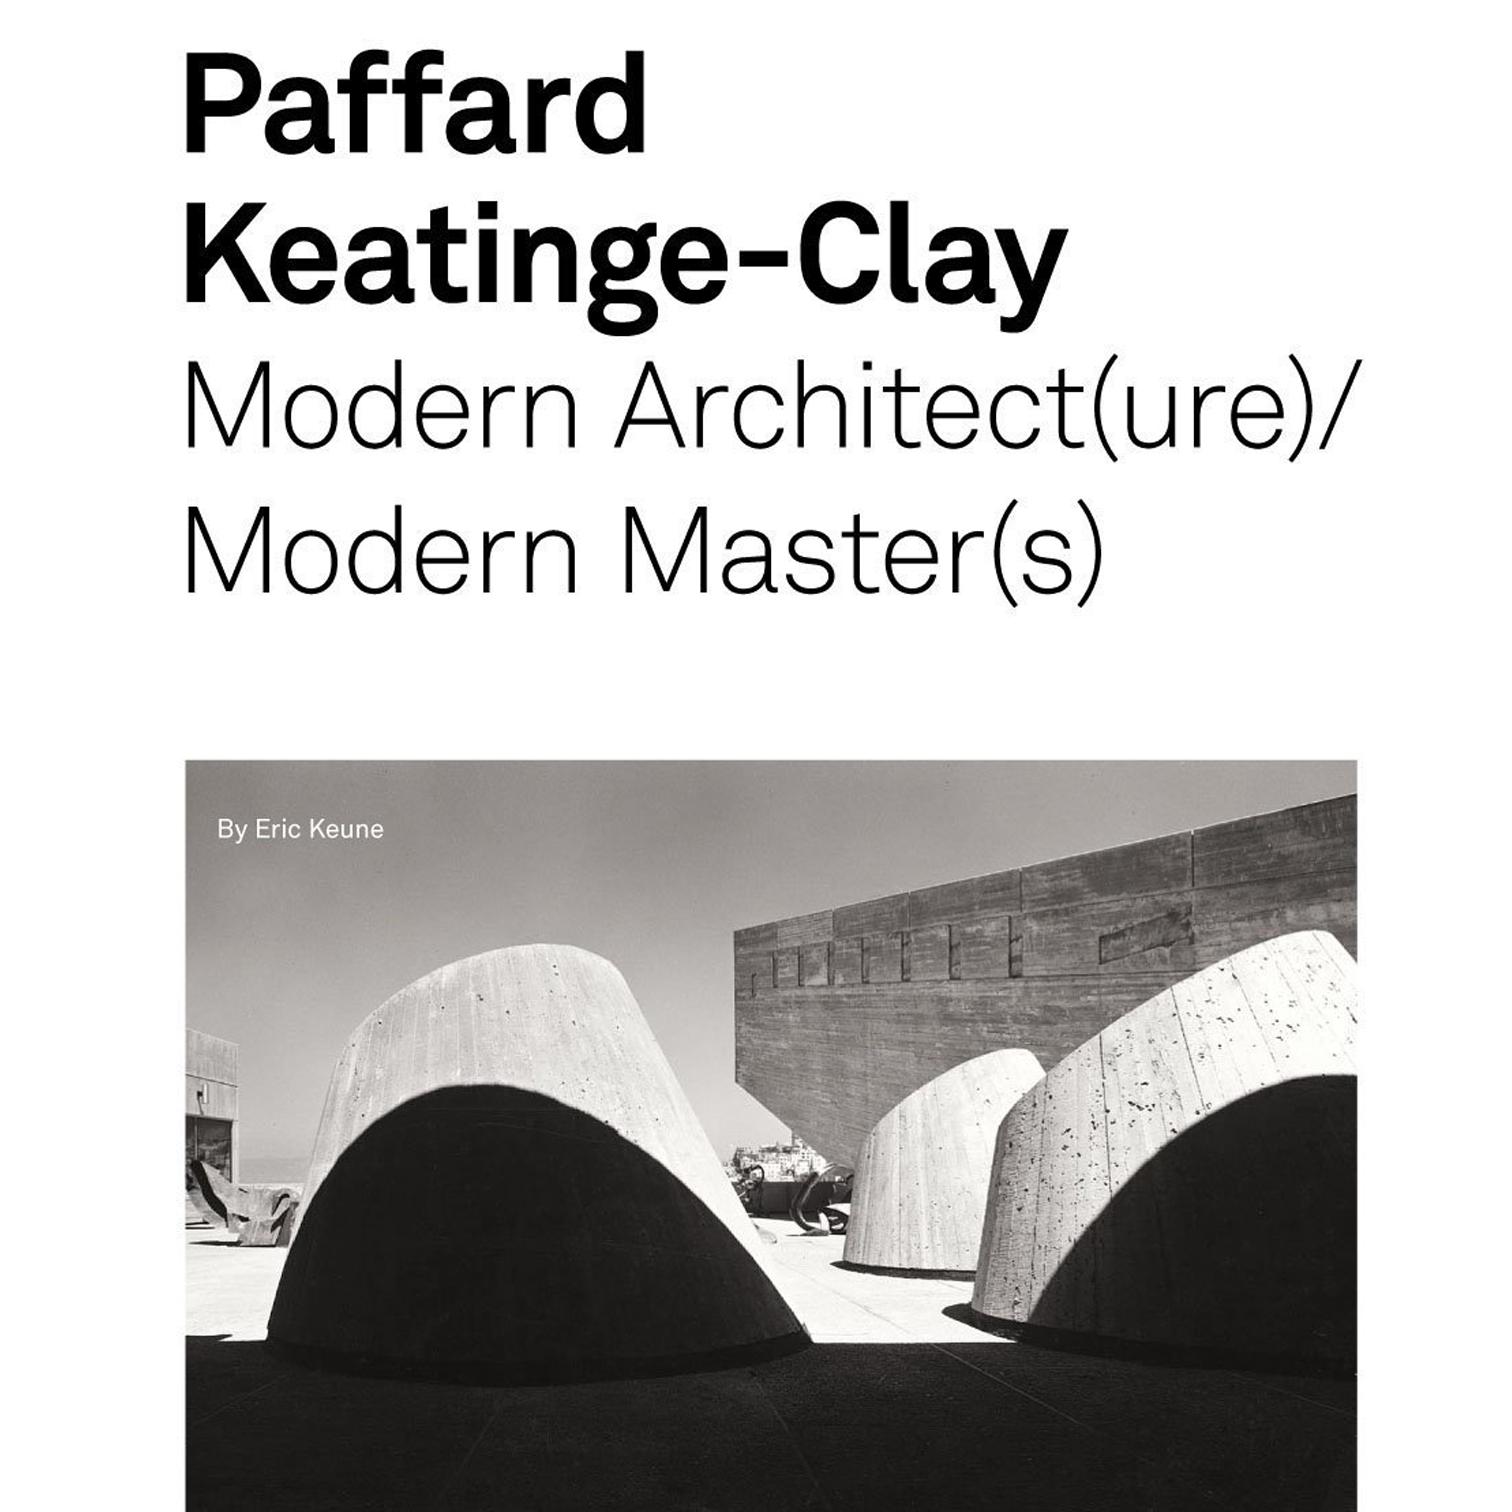 Paffard Keatinge-Clay